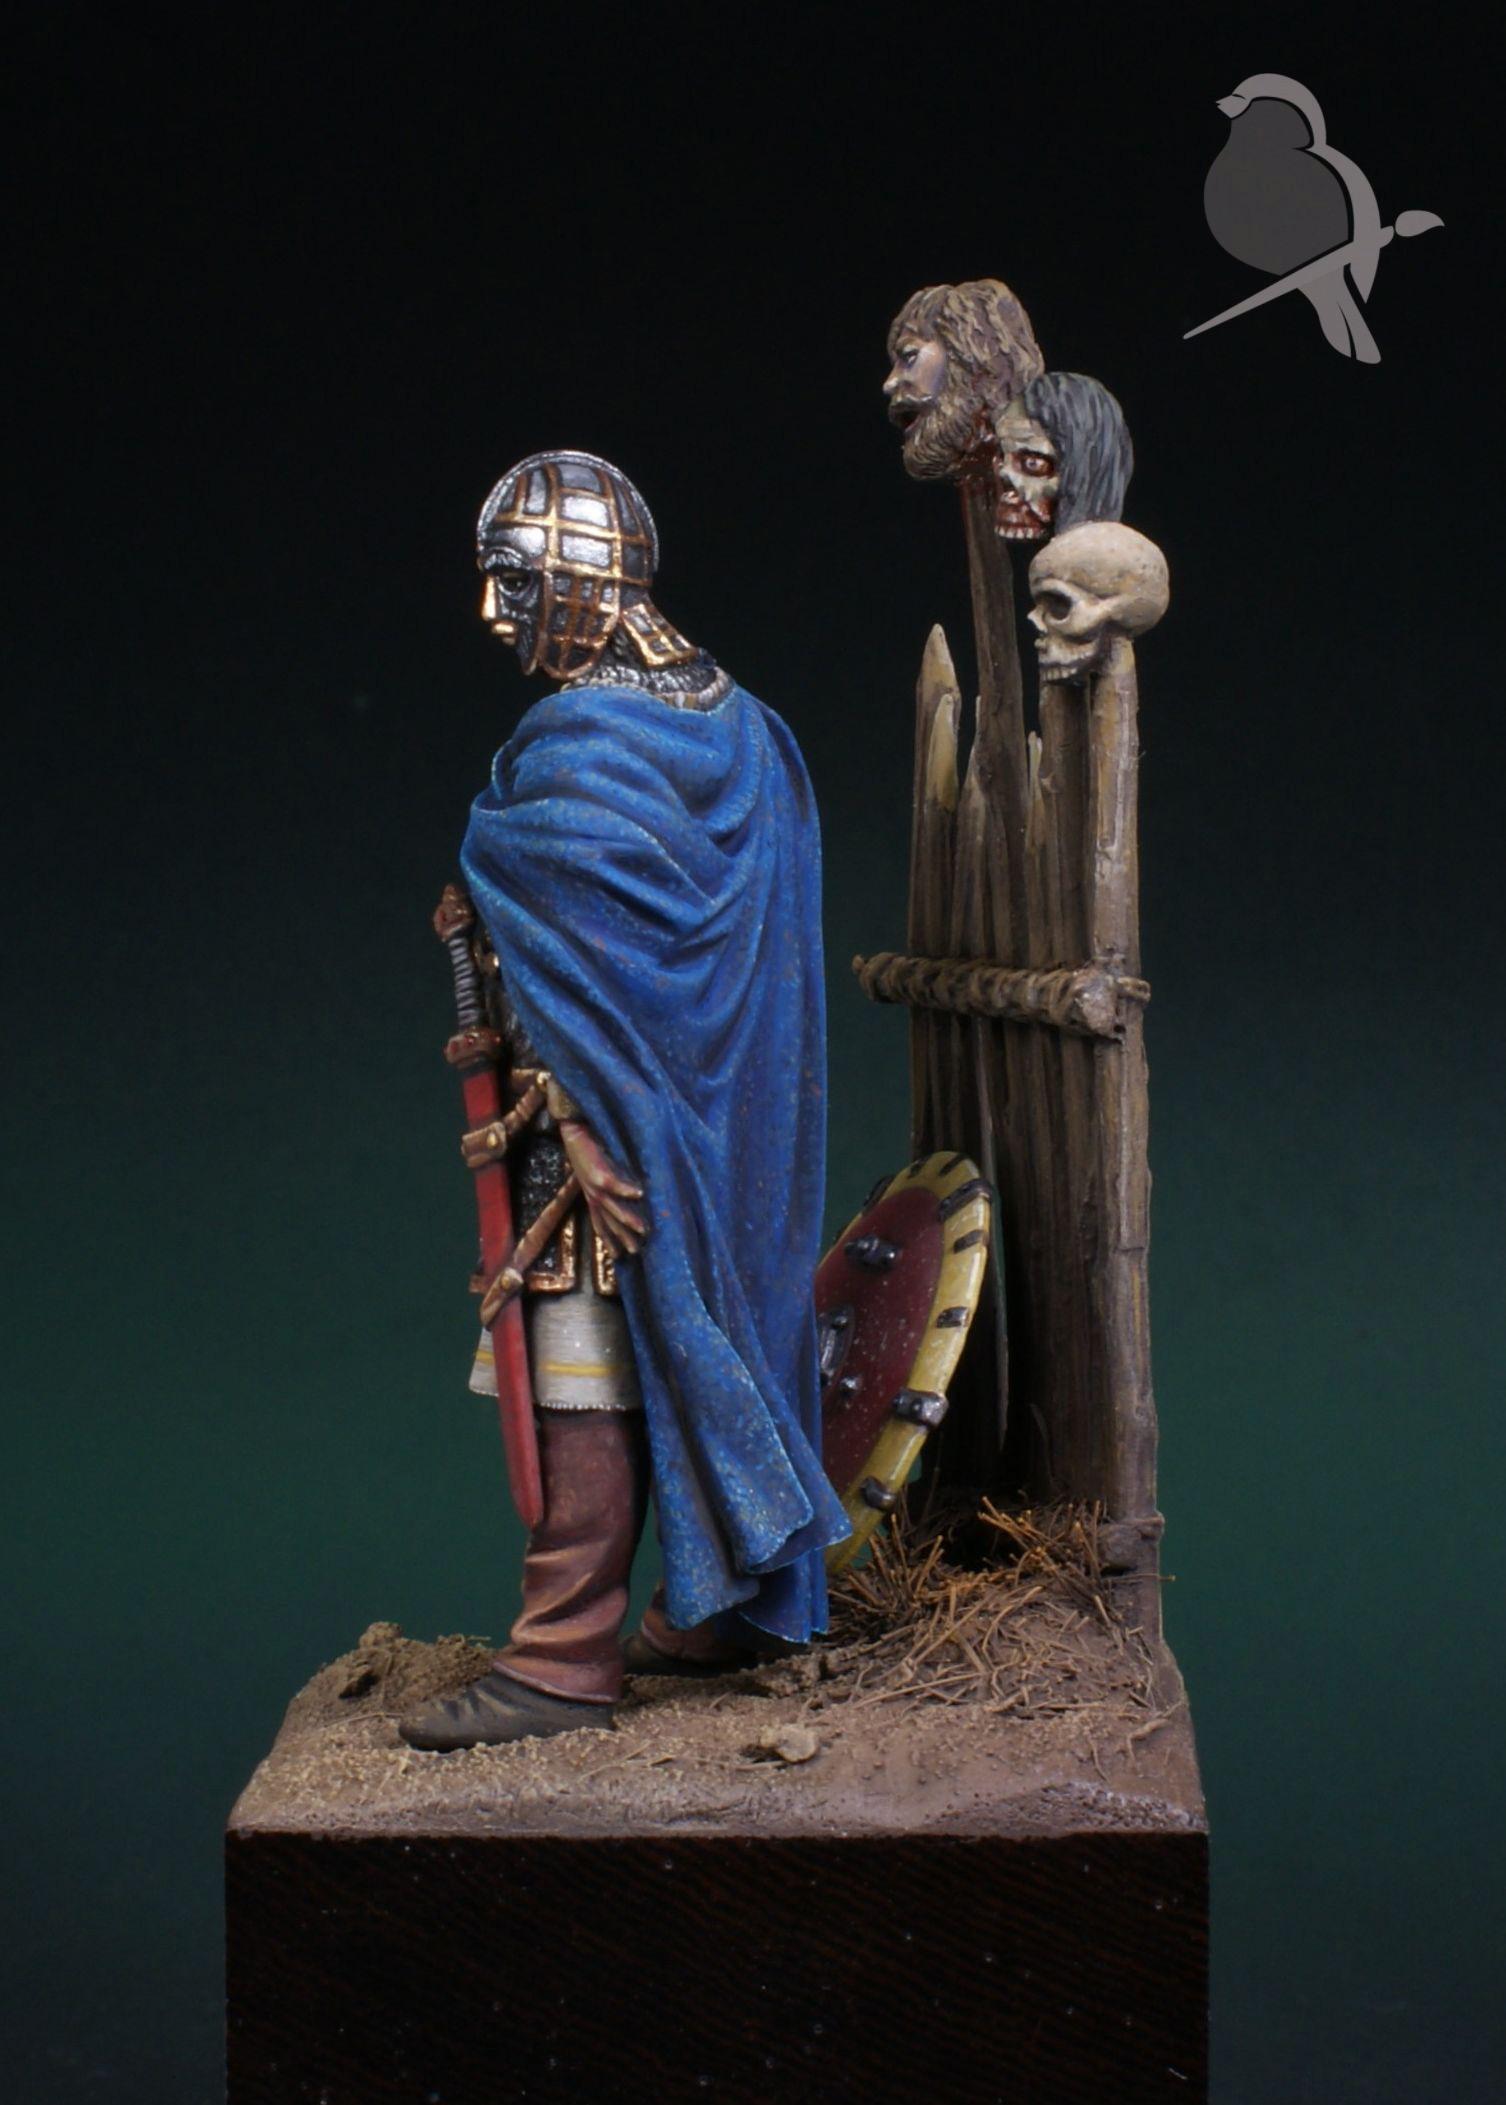 Figures: Saxon warlord, photo #3